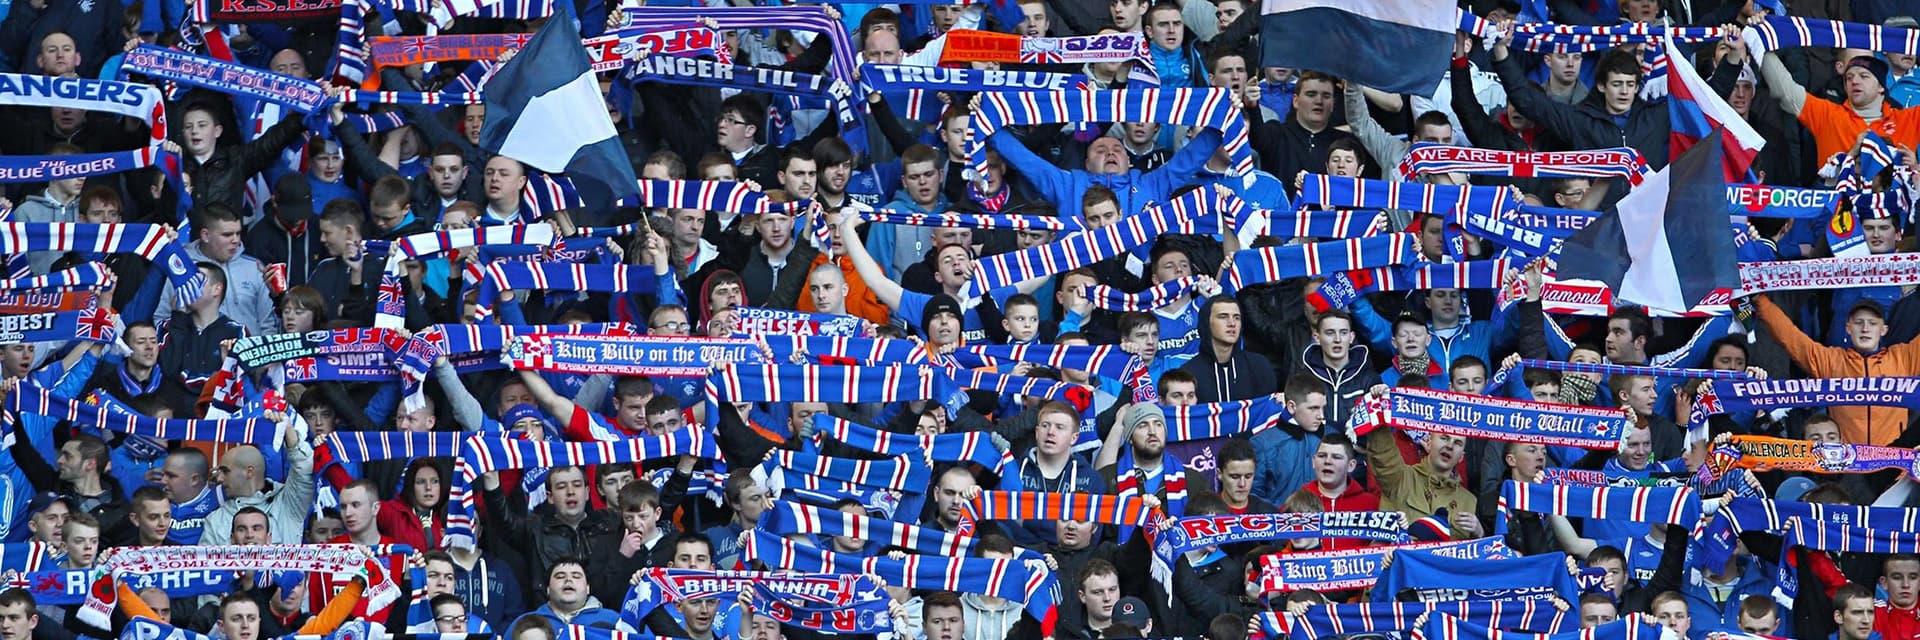 Rangers FC - Heart of Midlothian, 6 Novemberat 0:00